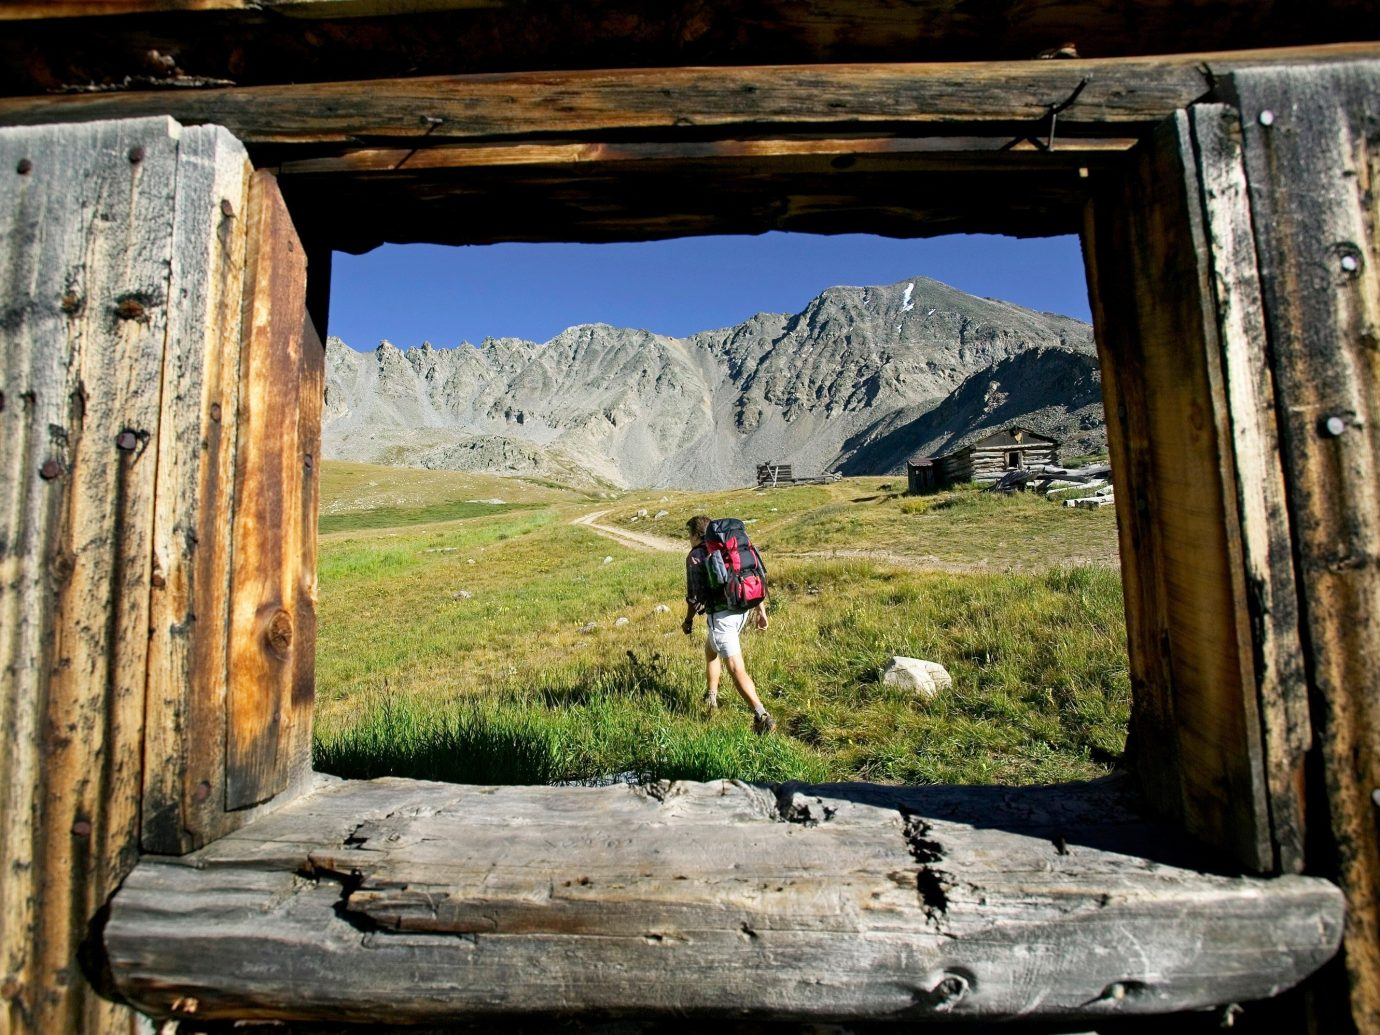 Road Trips Trip Ideas Weekend Getaways outdoor grass wooden rock wood Adventure